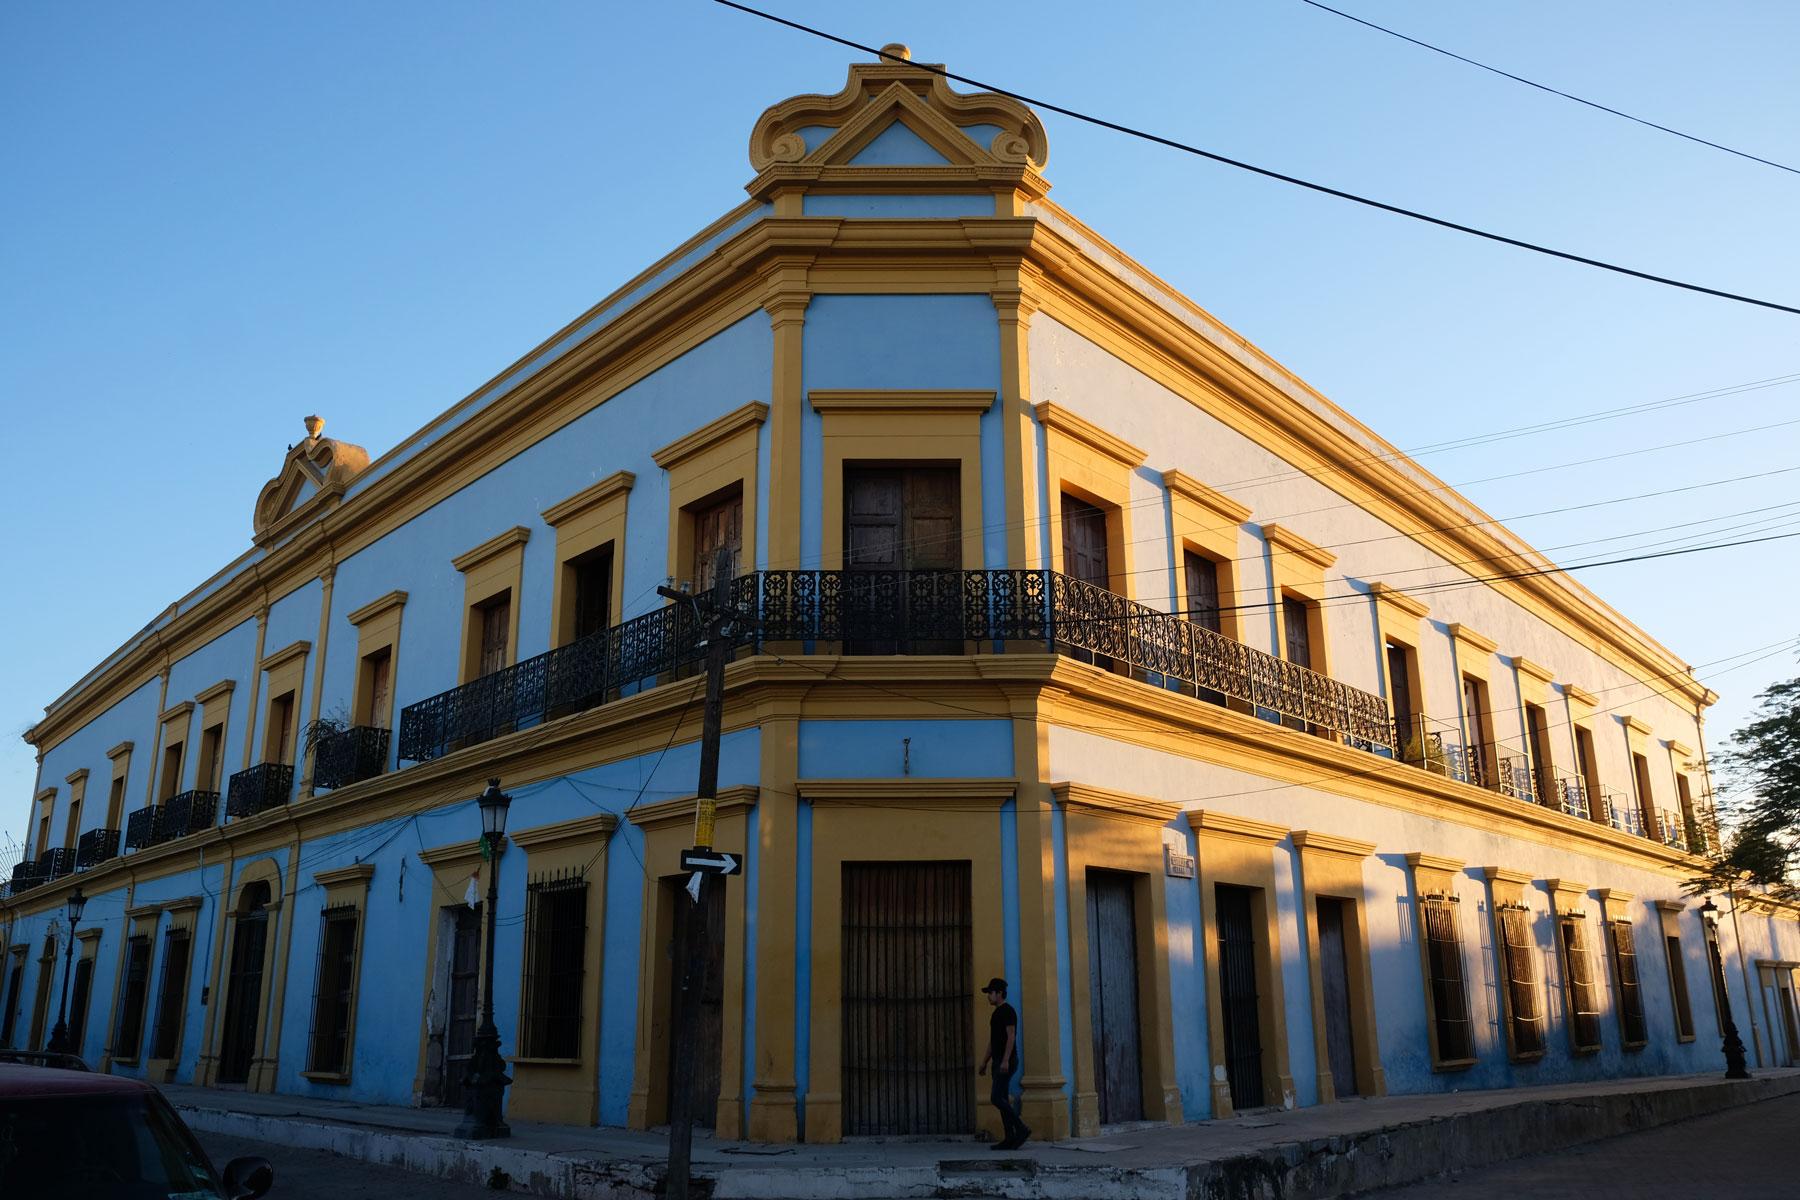 Kolonialarchitektur in El Fuerte, Mexiko.